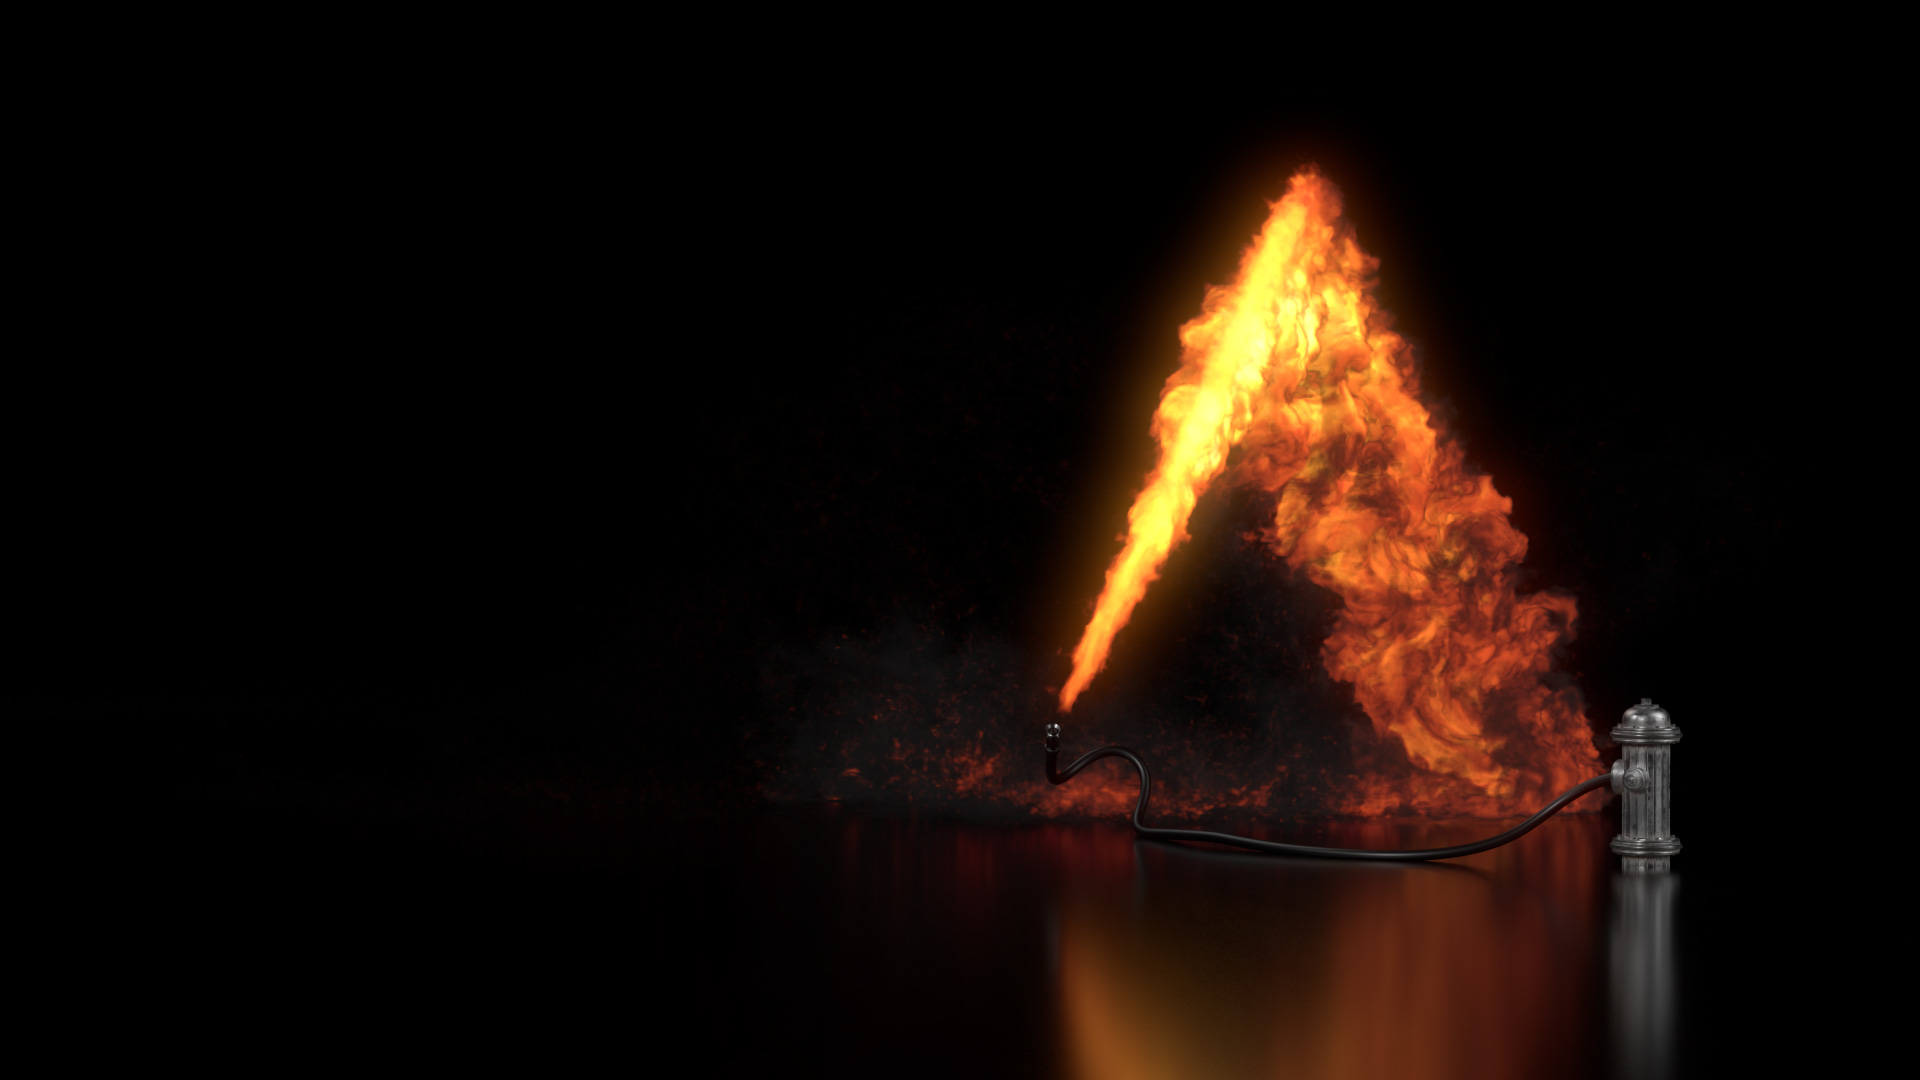 Fire Hydrant | SideFX